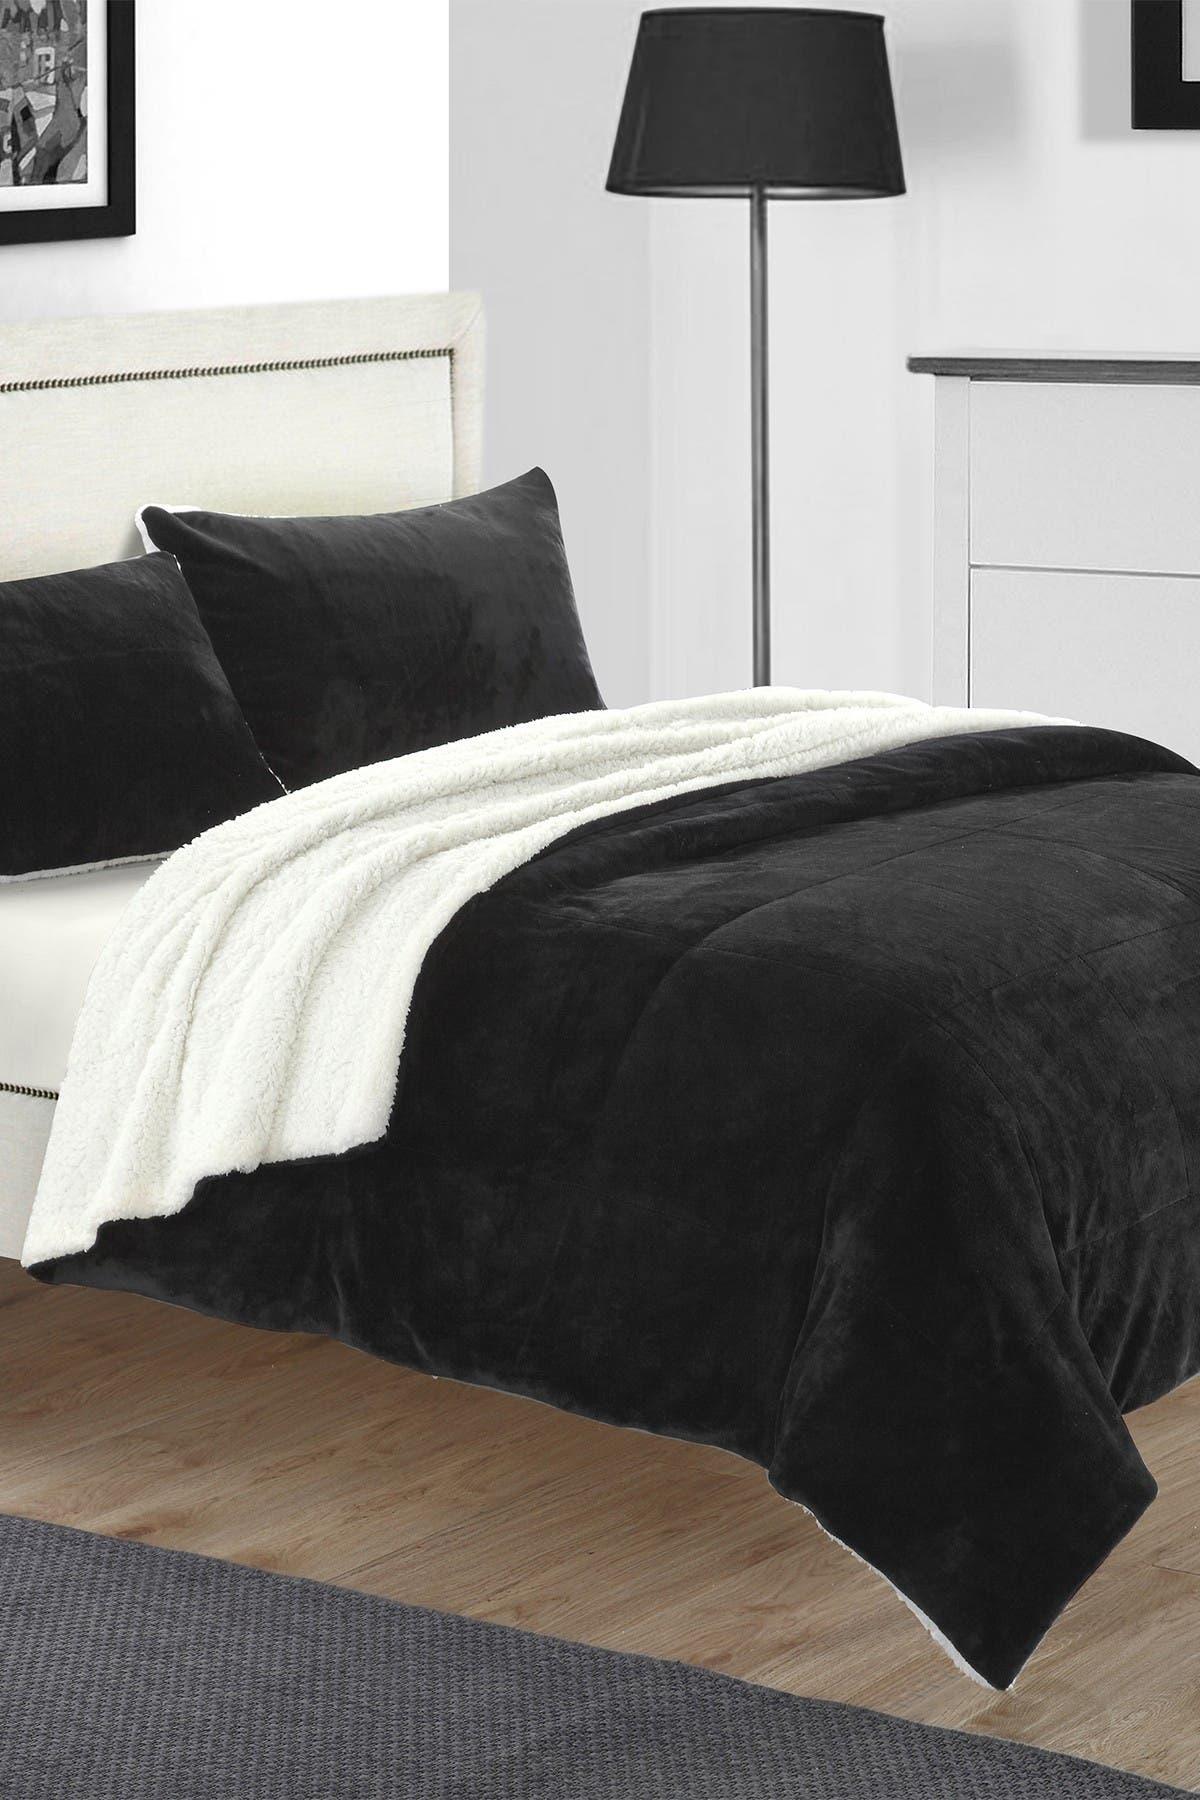 Chic Home Bedding King Evelyn Blanket Set Black Nordstrom Rack